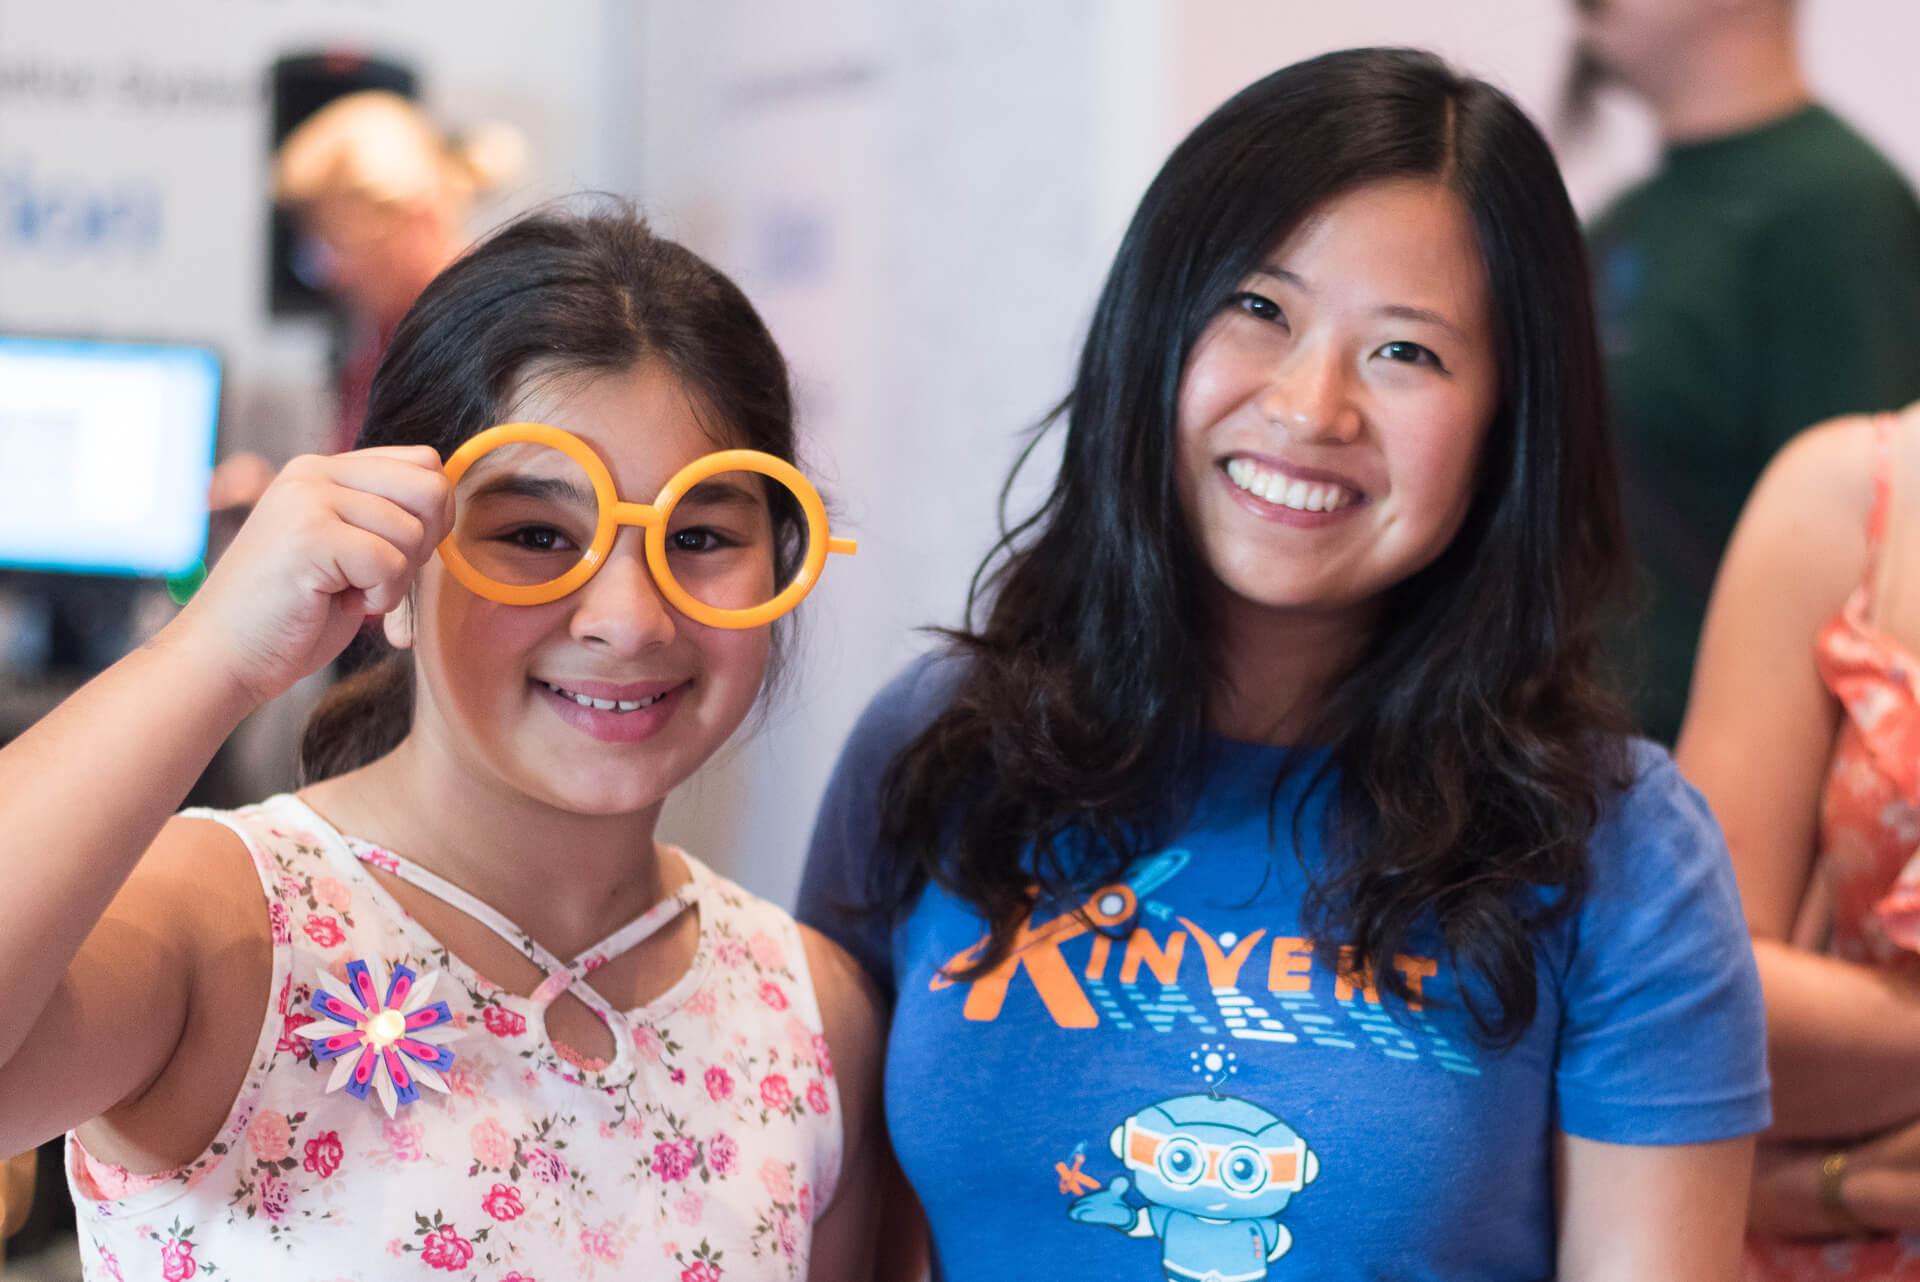 Maker Faire Detroit Kinvert helped girls learn STEM 3D Printing affordable glasses for disabled